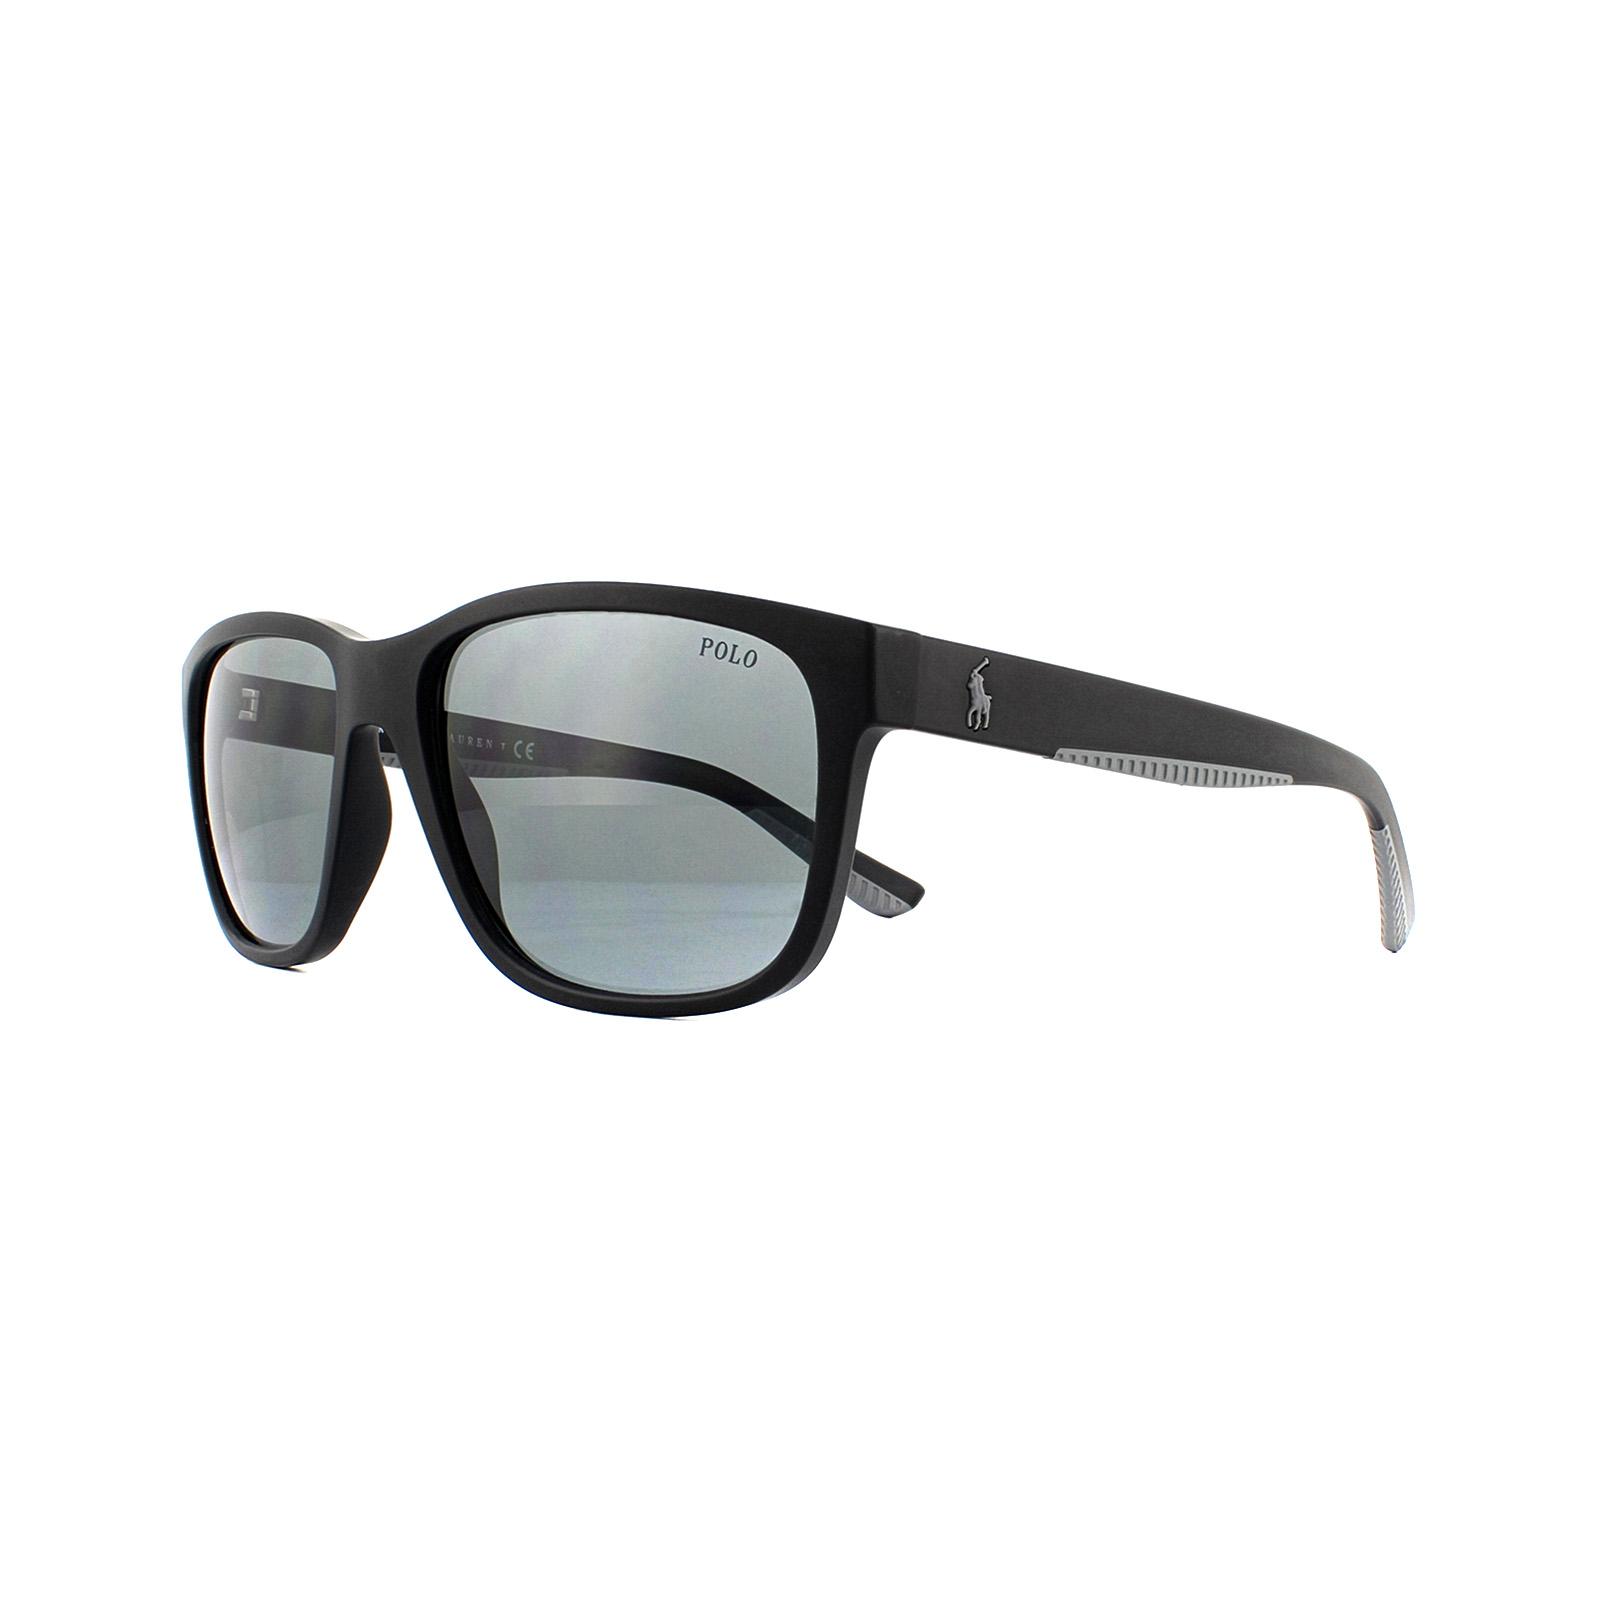 91e1cf082 Sentinel Polo Ralph Lauren Sunglasses PH4142 528487 Matte Black Grey